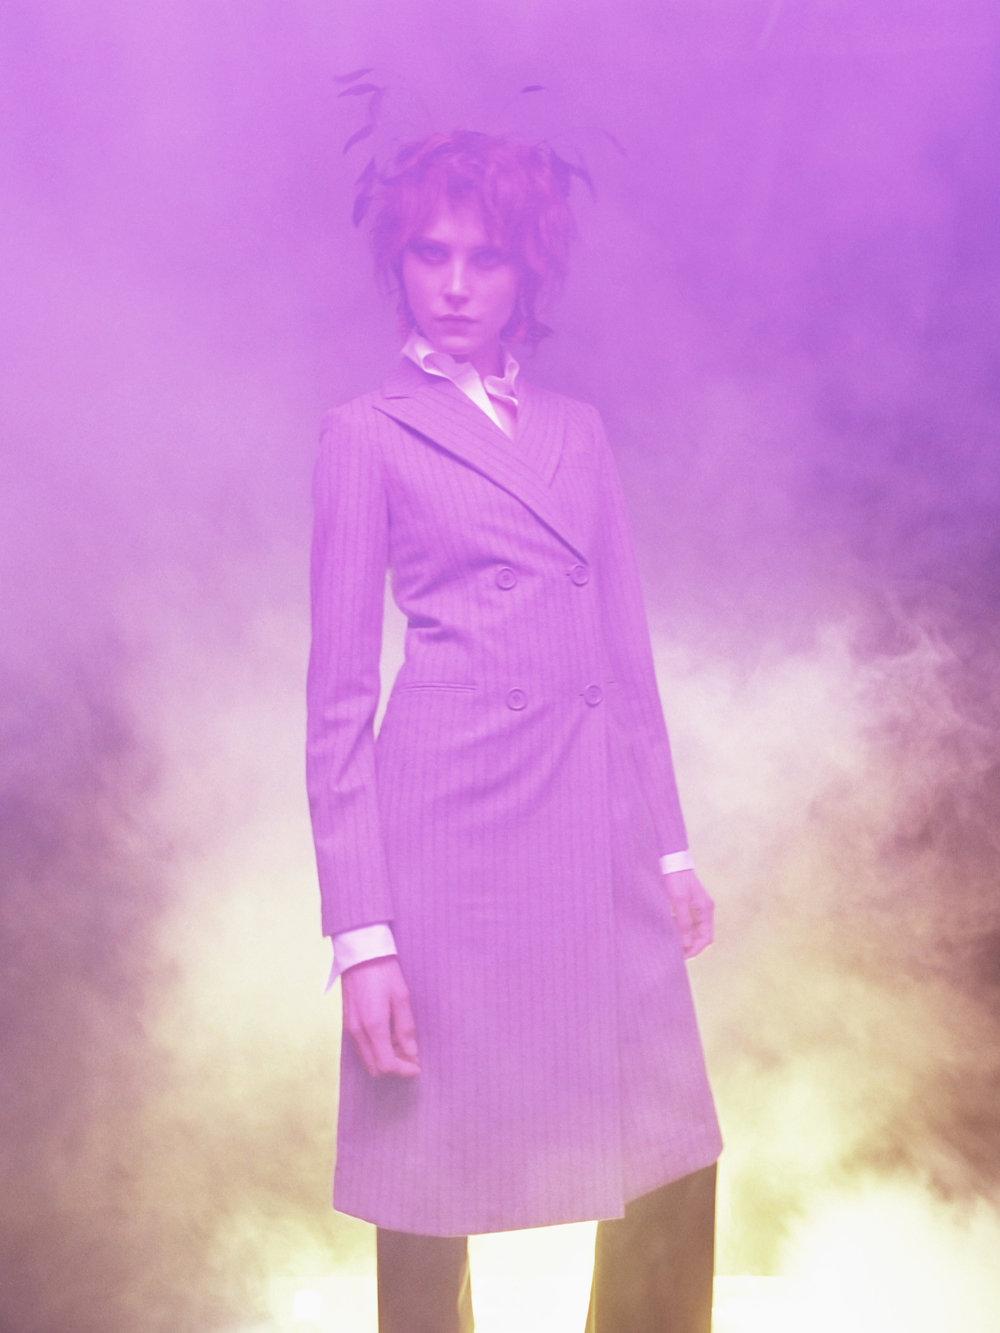 Purple+Haze+fashion+photography+by+Patrik+Andersson.jpeg